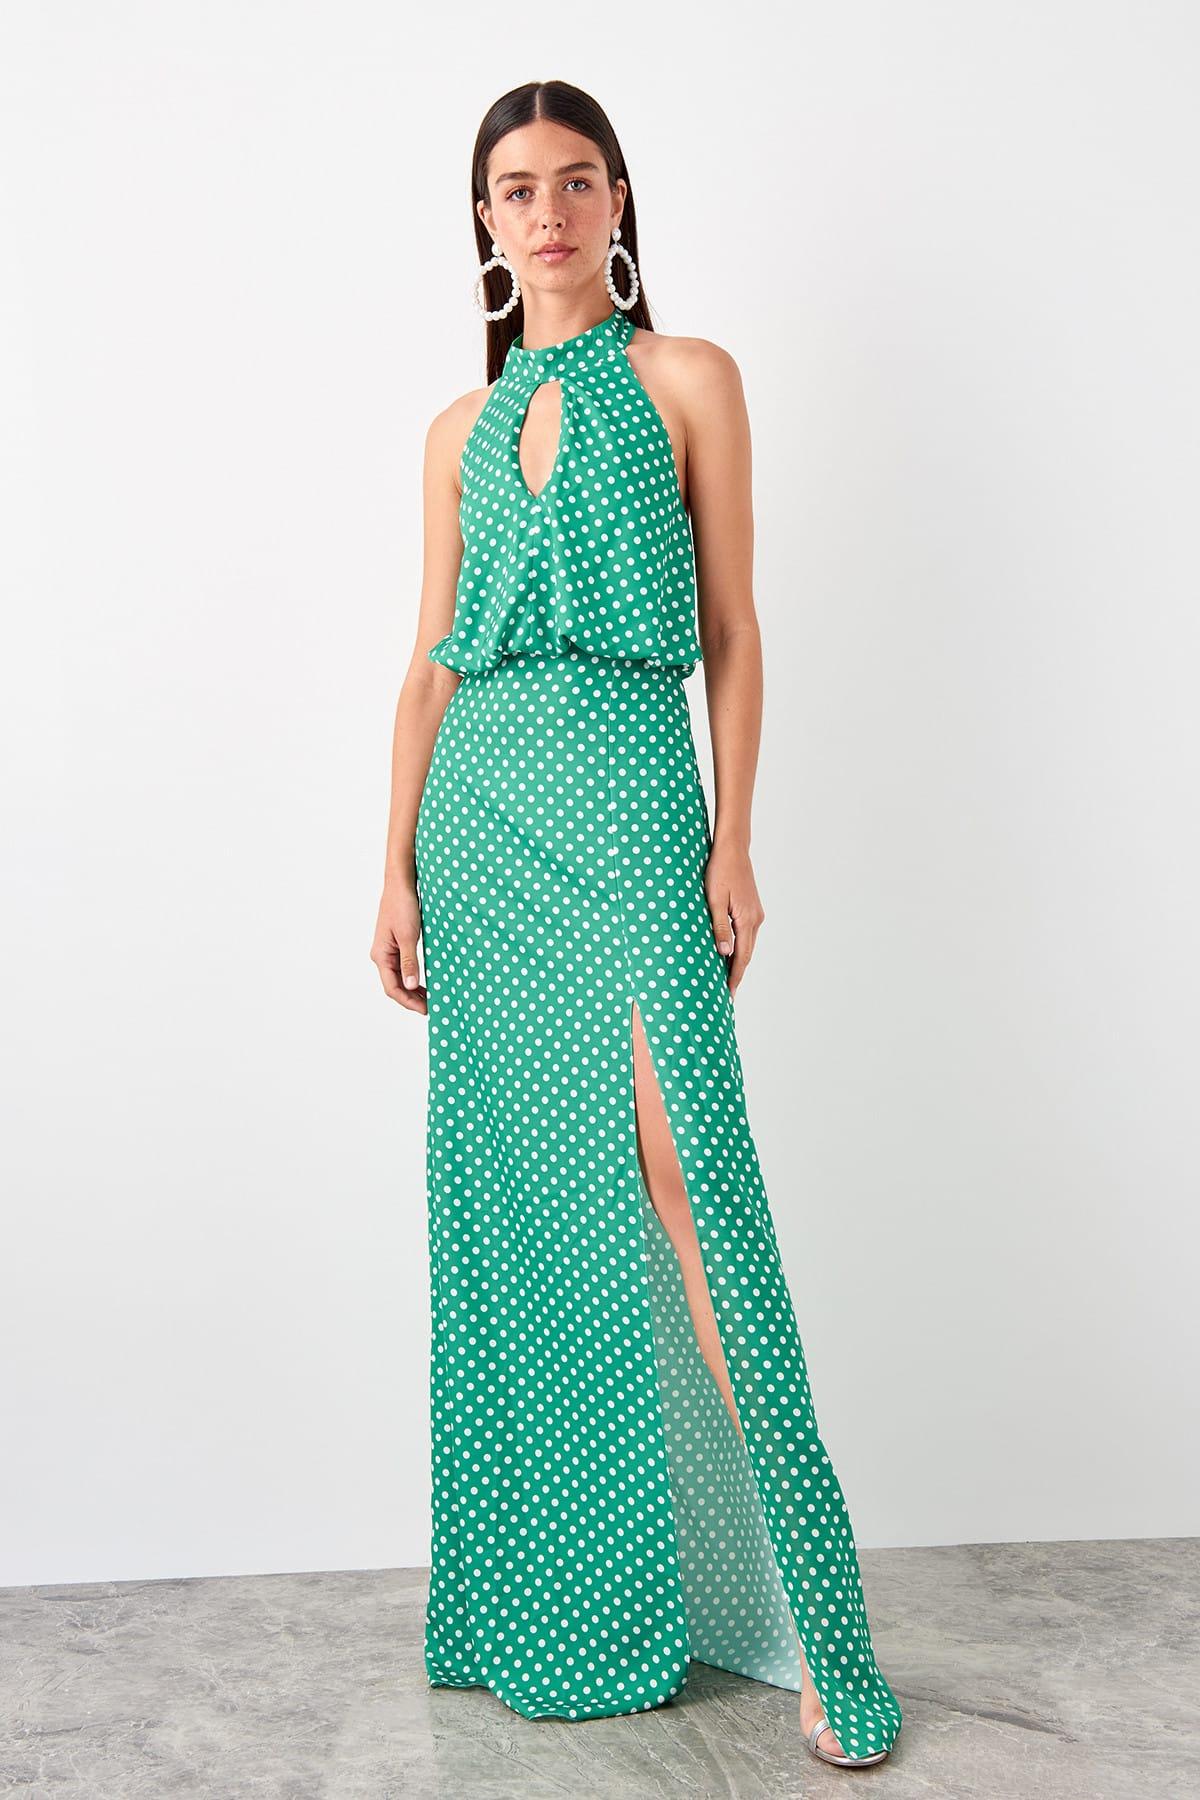 Trendyol Polka Dot Evening Dress TPRSS19AE0130|Evening Dresses|   - AliExpress